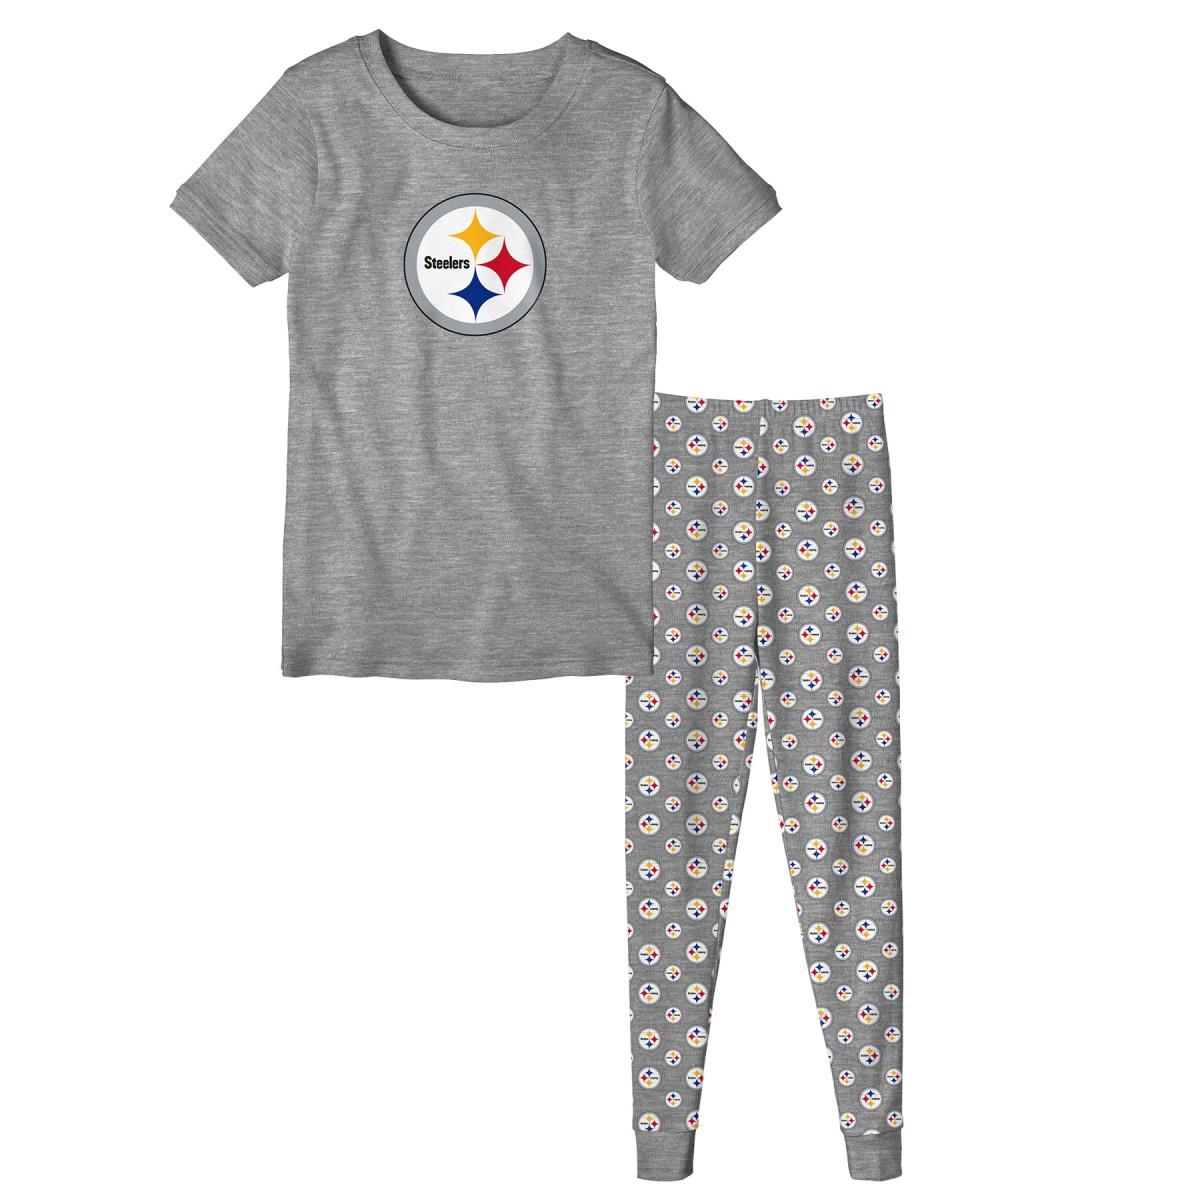 "Pittsburgh Steelers Youth NFL ""Playoff Bound"" Pajama T-shirt & Sleep Pant Set"